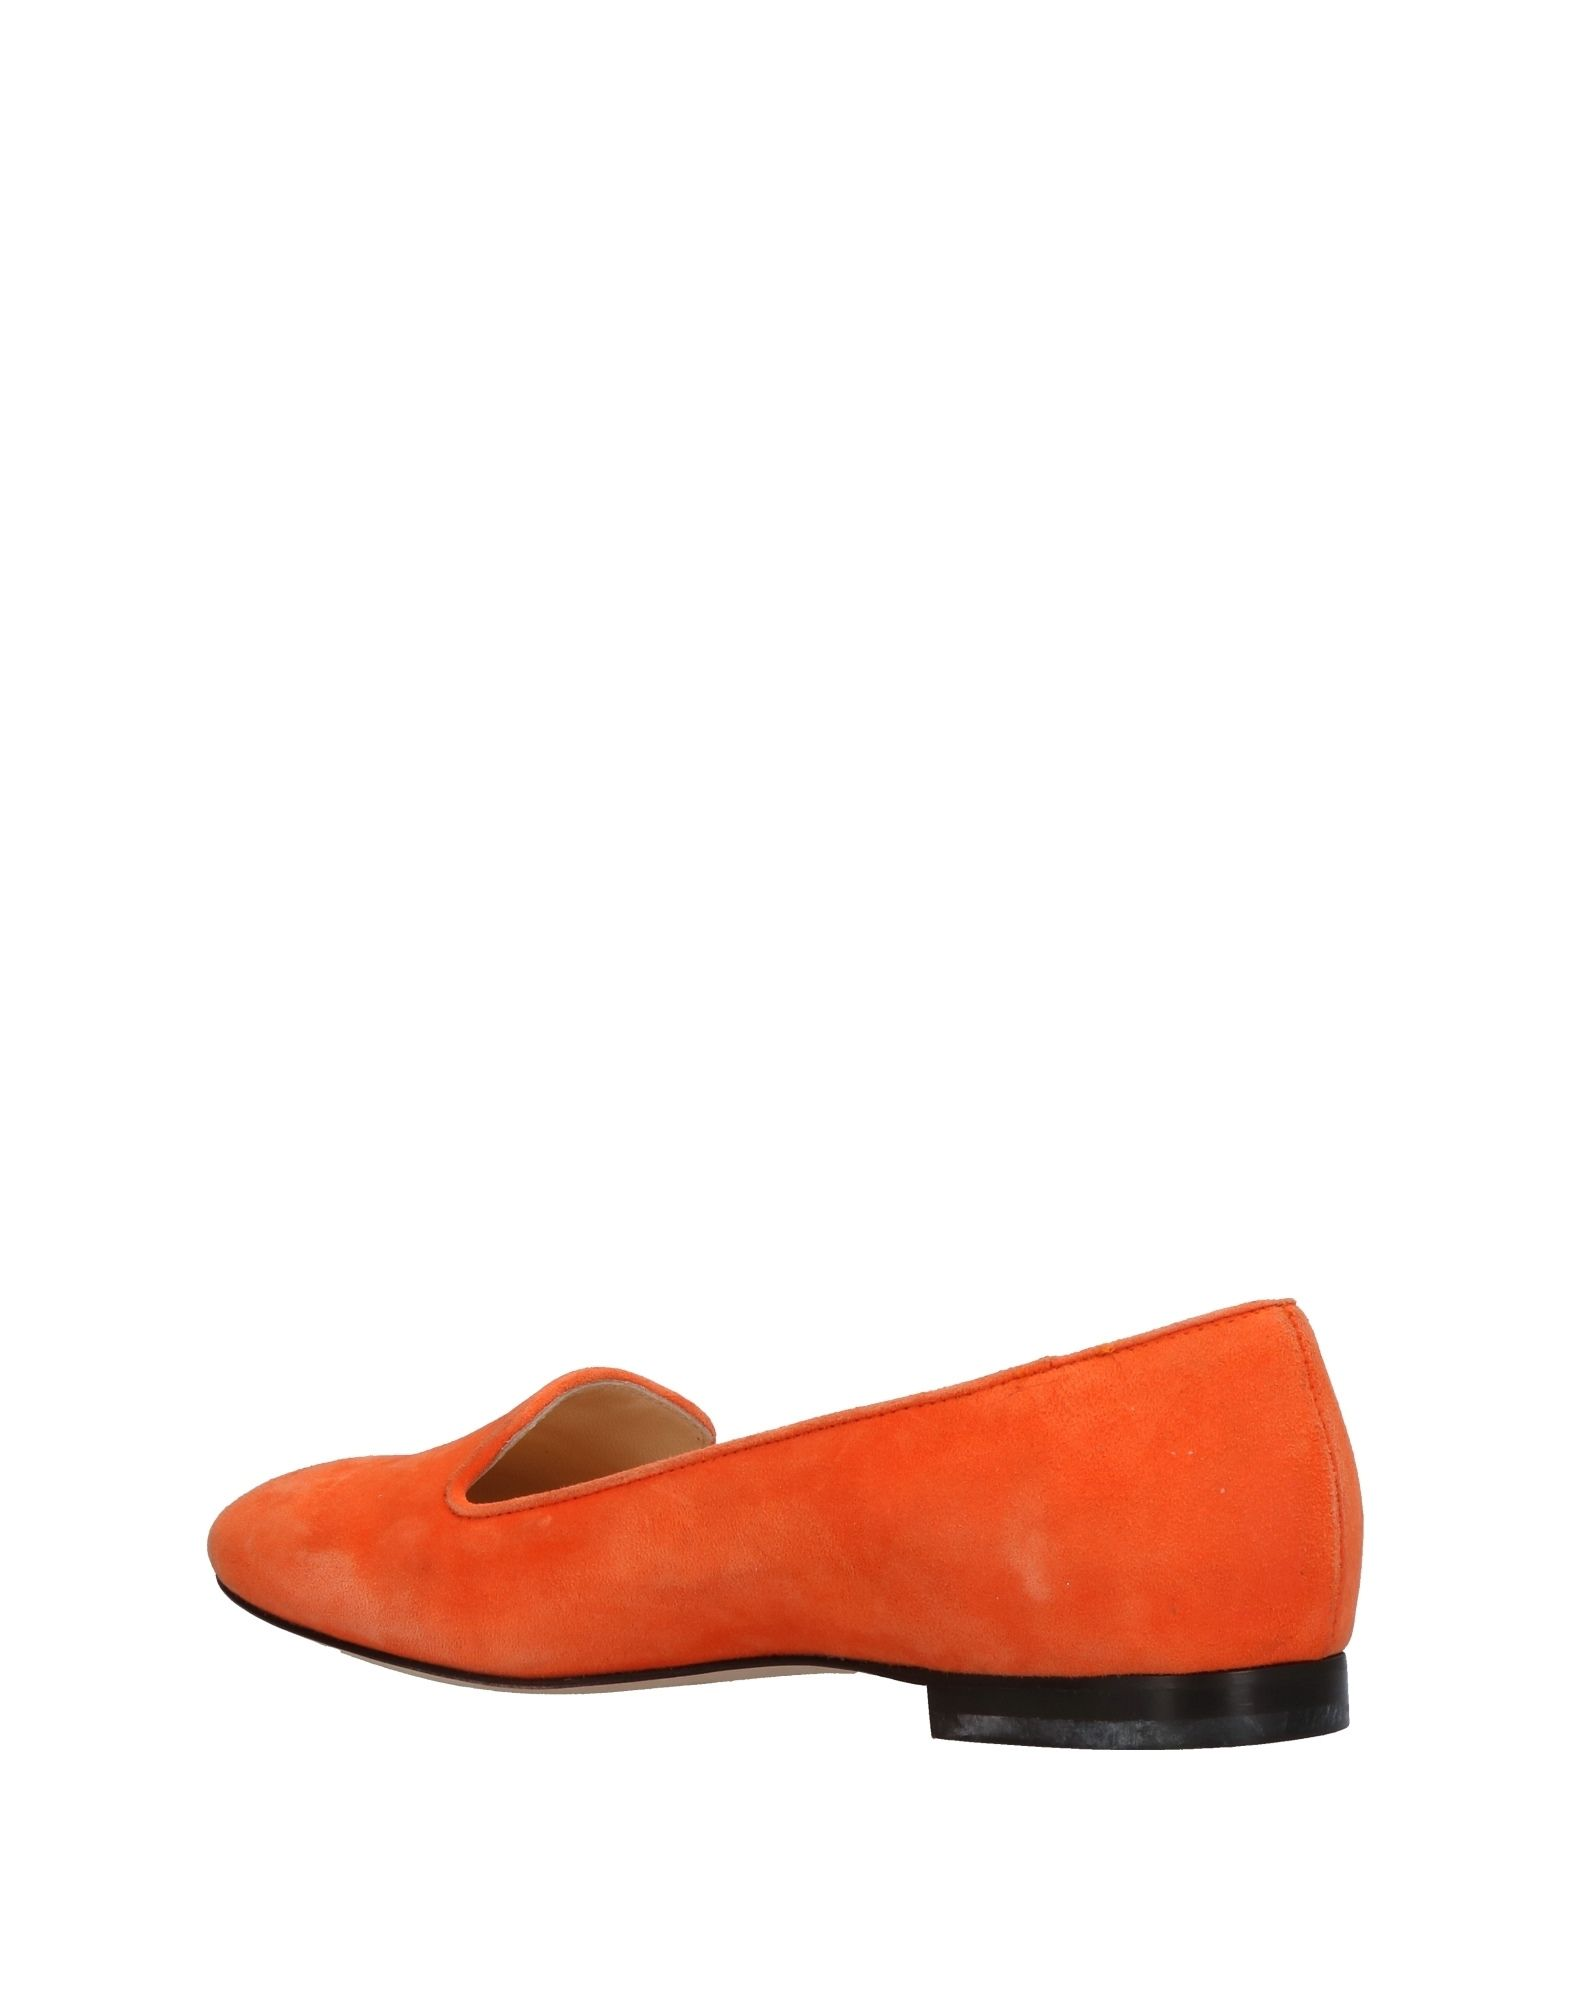 Stilvolle billige Schuhe Arfango Mokassins Mokassins Mokassins Damen  11393247MP 8487db